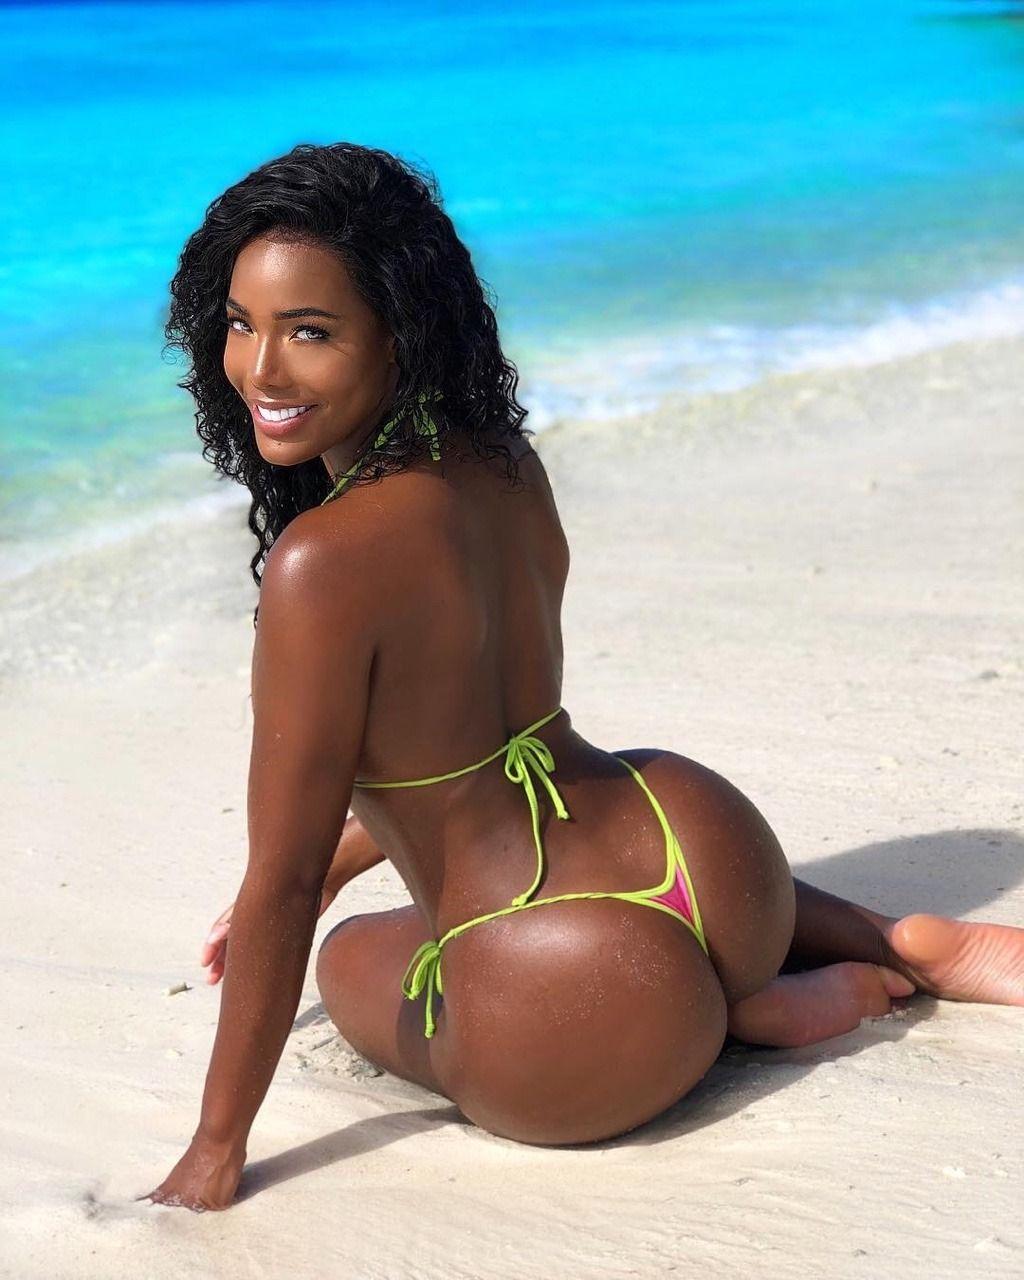 Hot light skin black chick natural tits 9